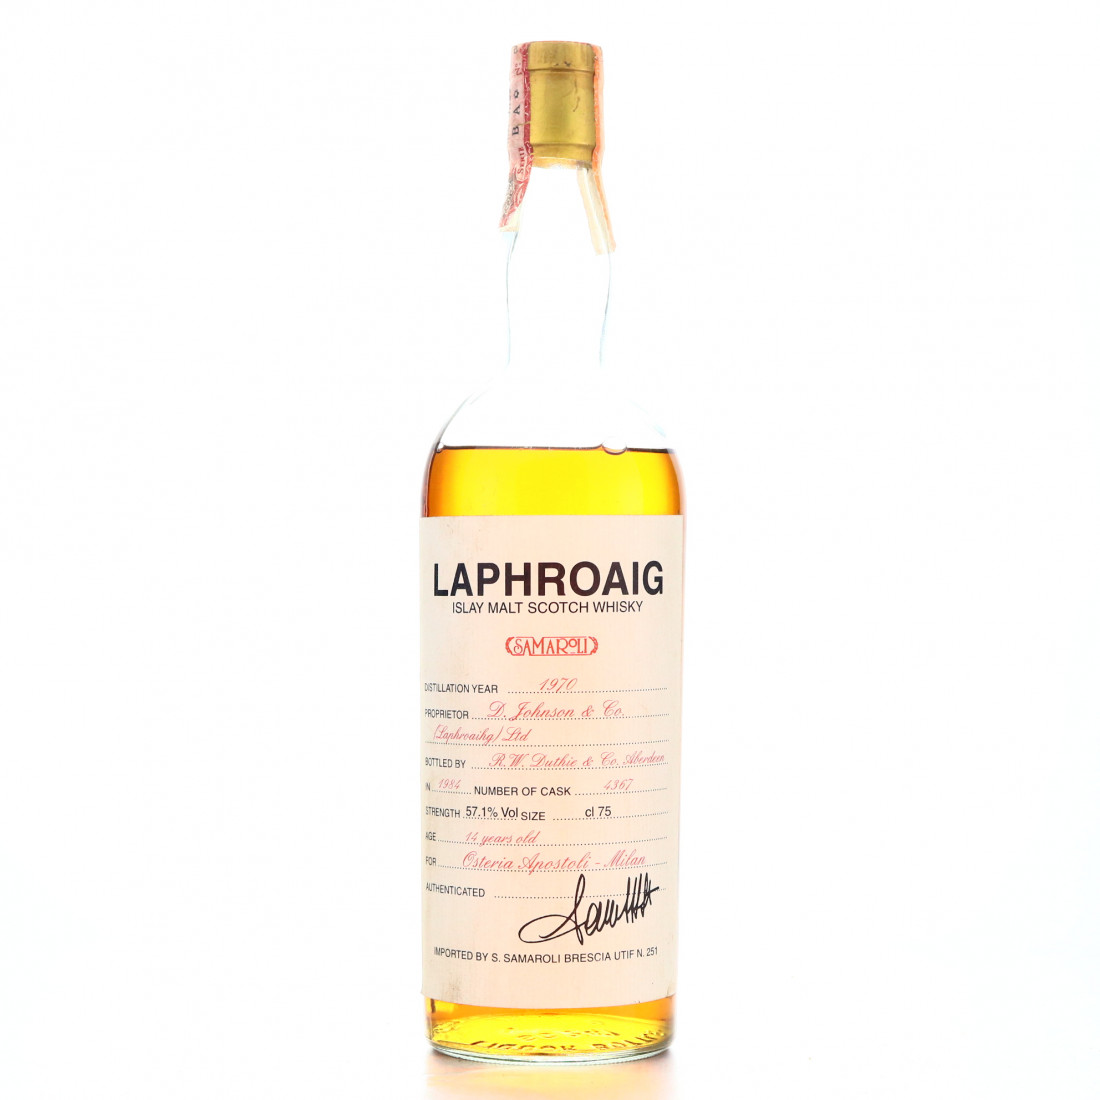 Laphroaig 1970 Samaroli 14 Year Old / Osteria Apostoli